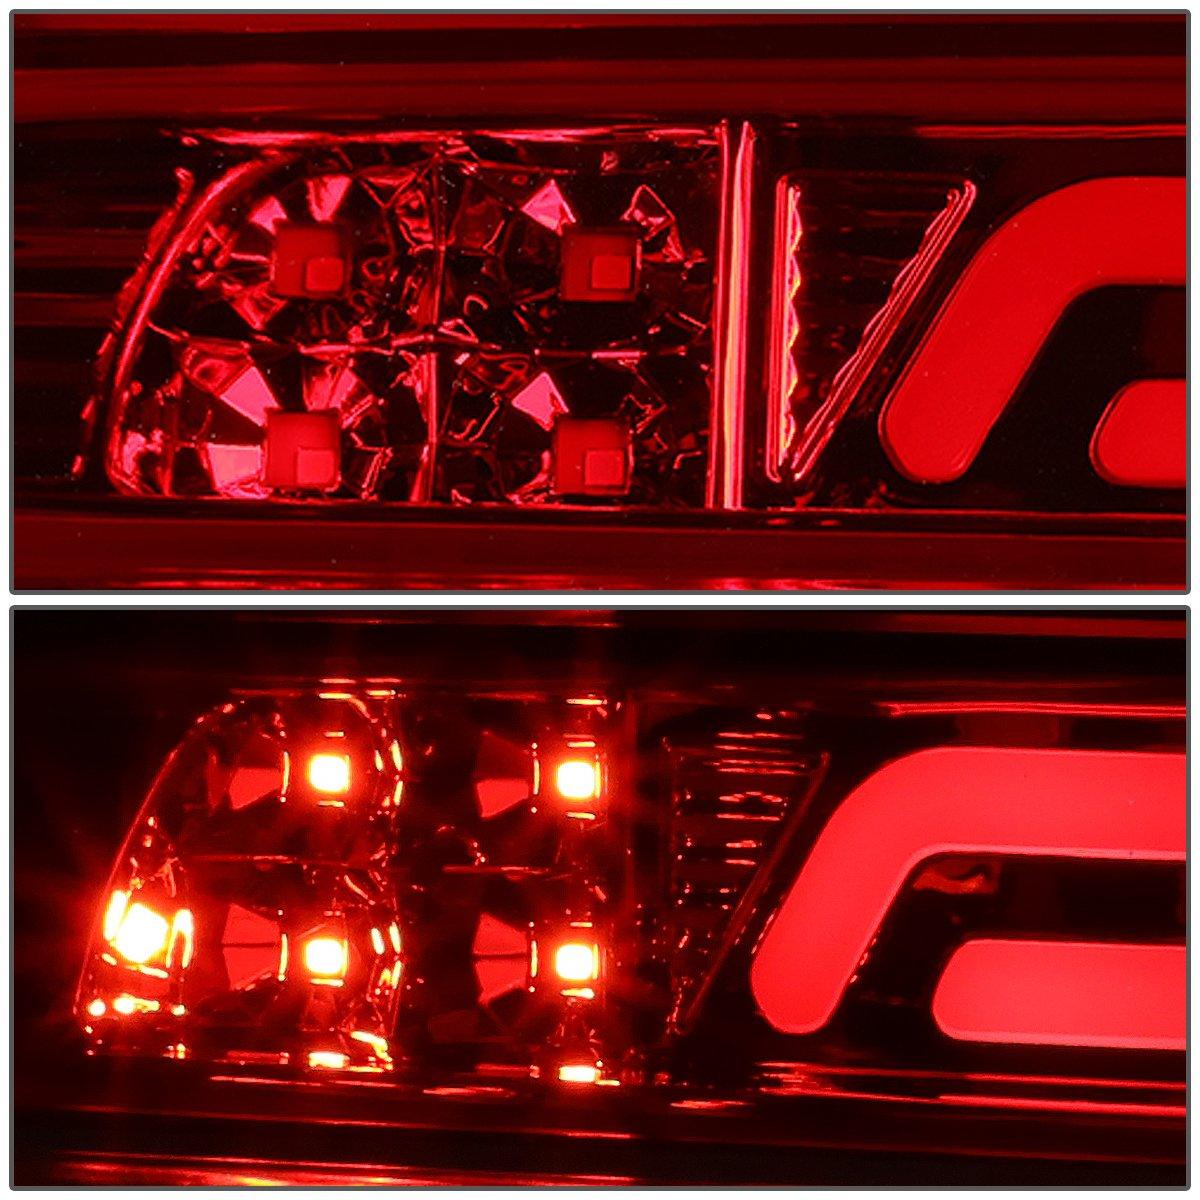 DNA MOTORING 3BL-TTU07-3D-LED-BK-SM 3D LED Bar Third Brake//Cargo Light Black//Smoked for 07-18 Tundra